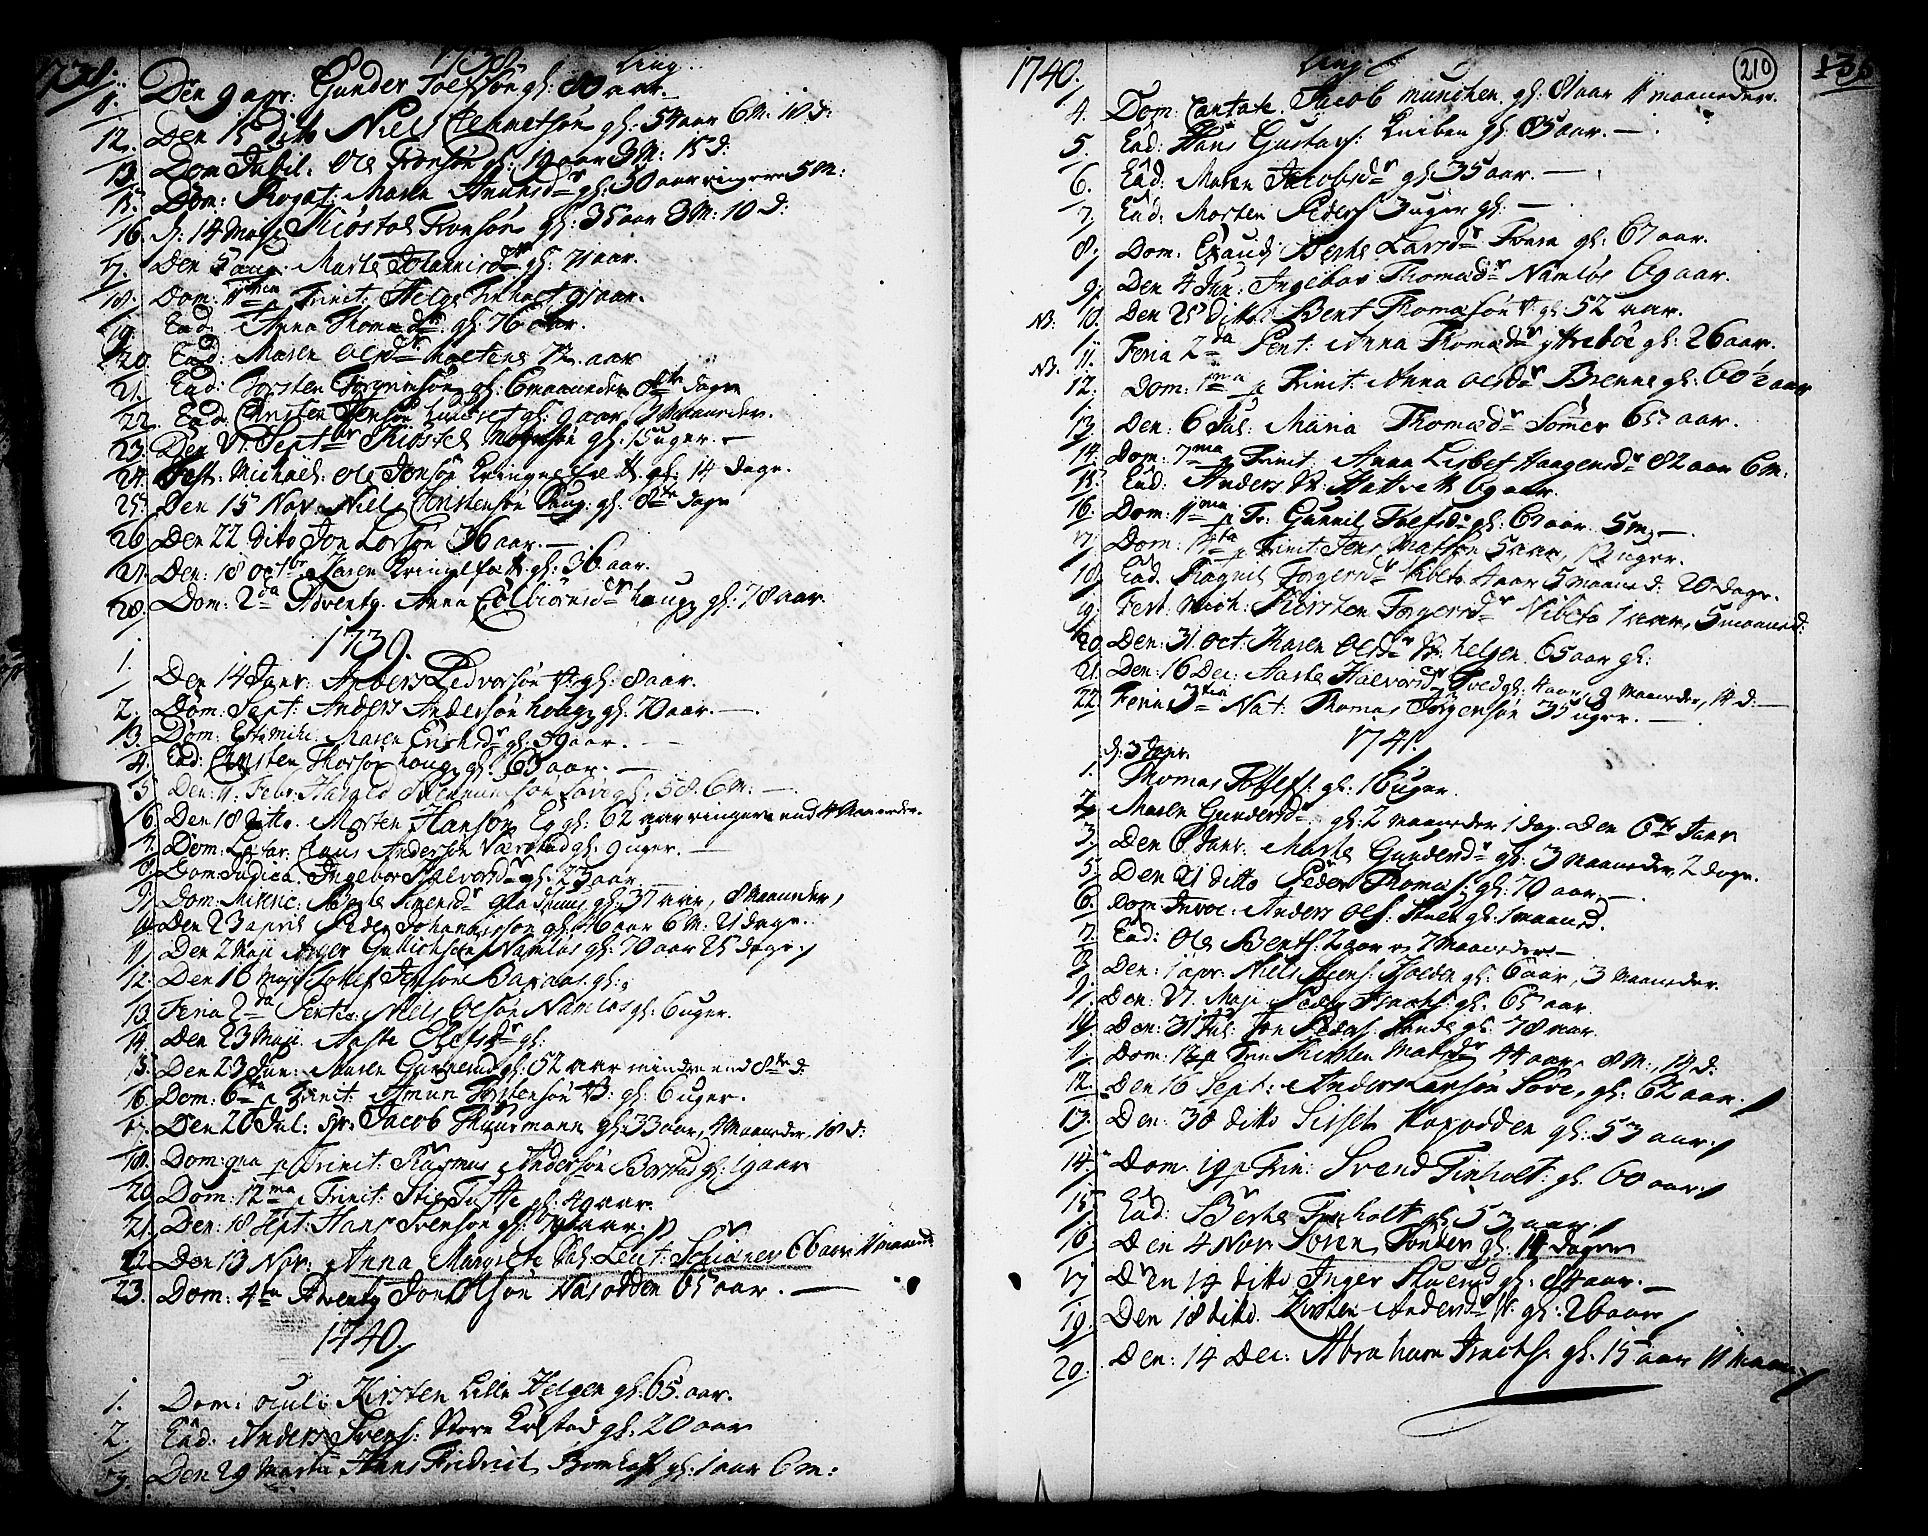 SAKO, Holla kirkebøker, F/Fa/L0001: Ministerialbok nr. 1, 1717-1779, s. 210